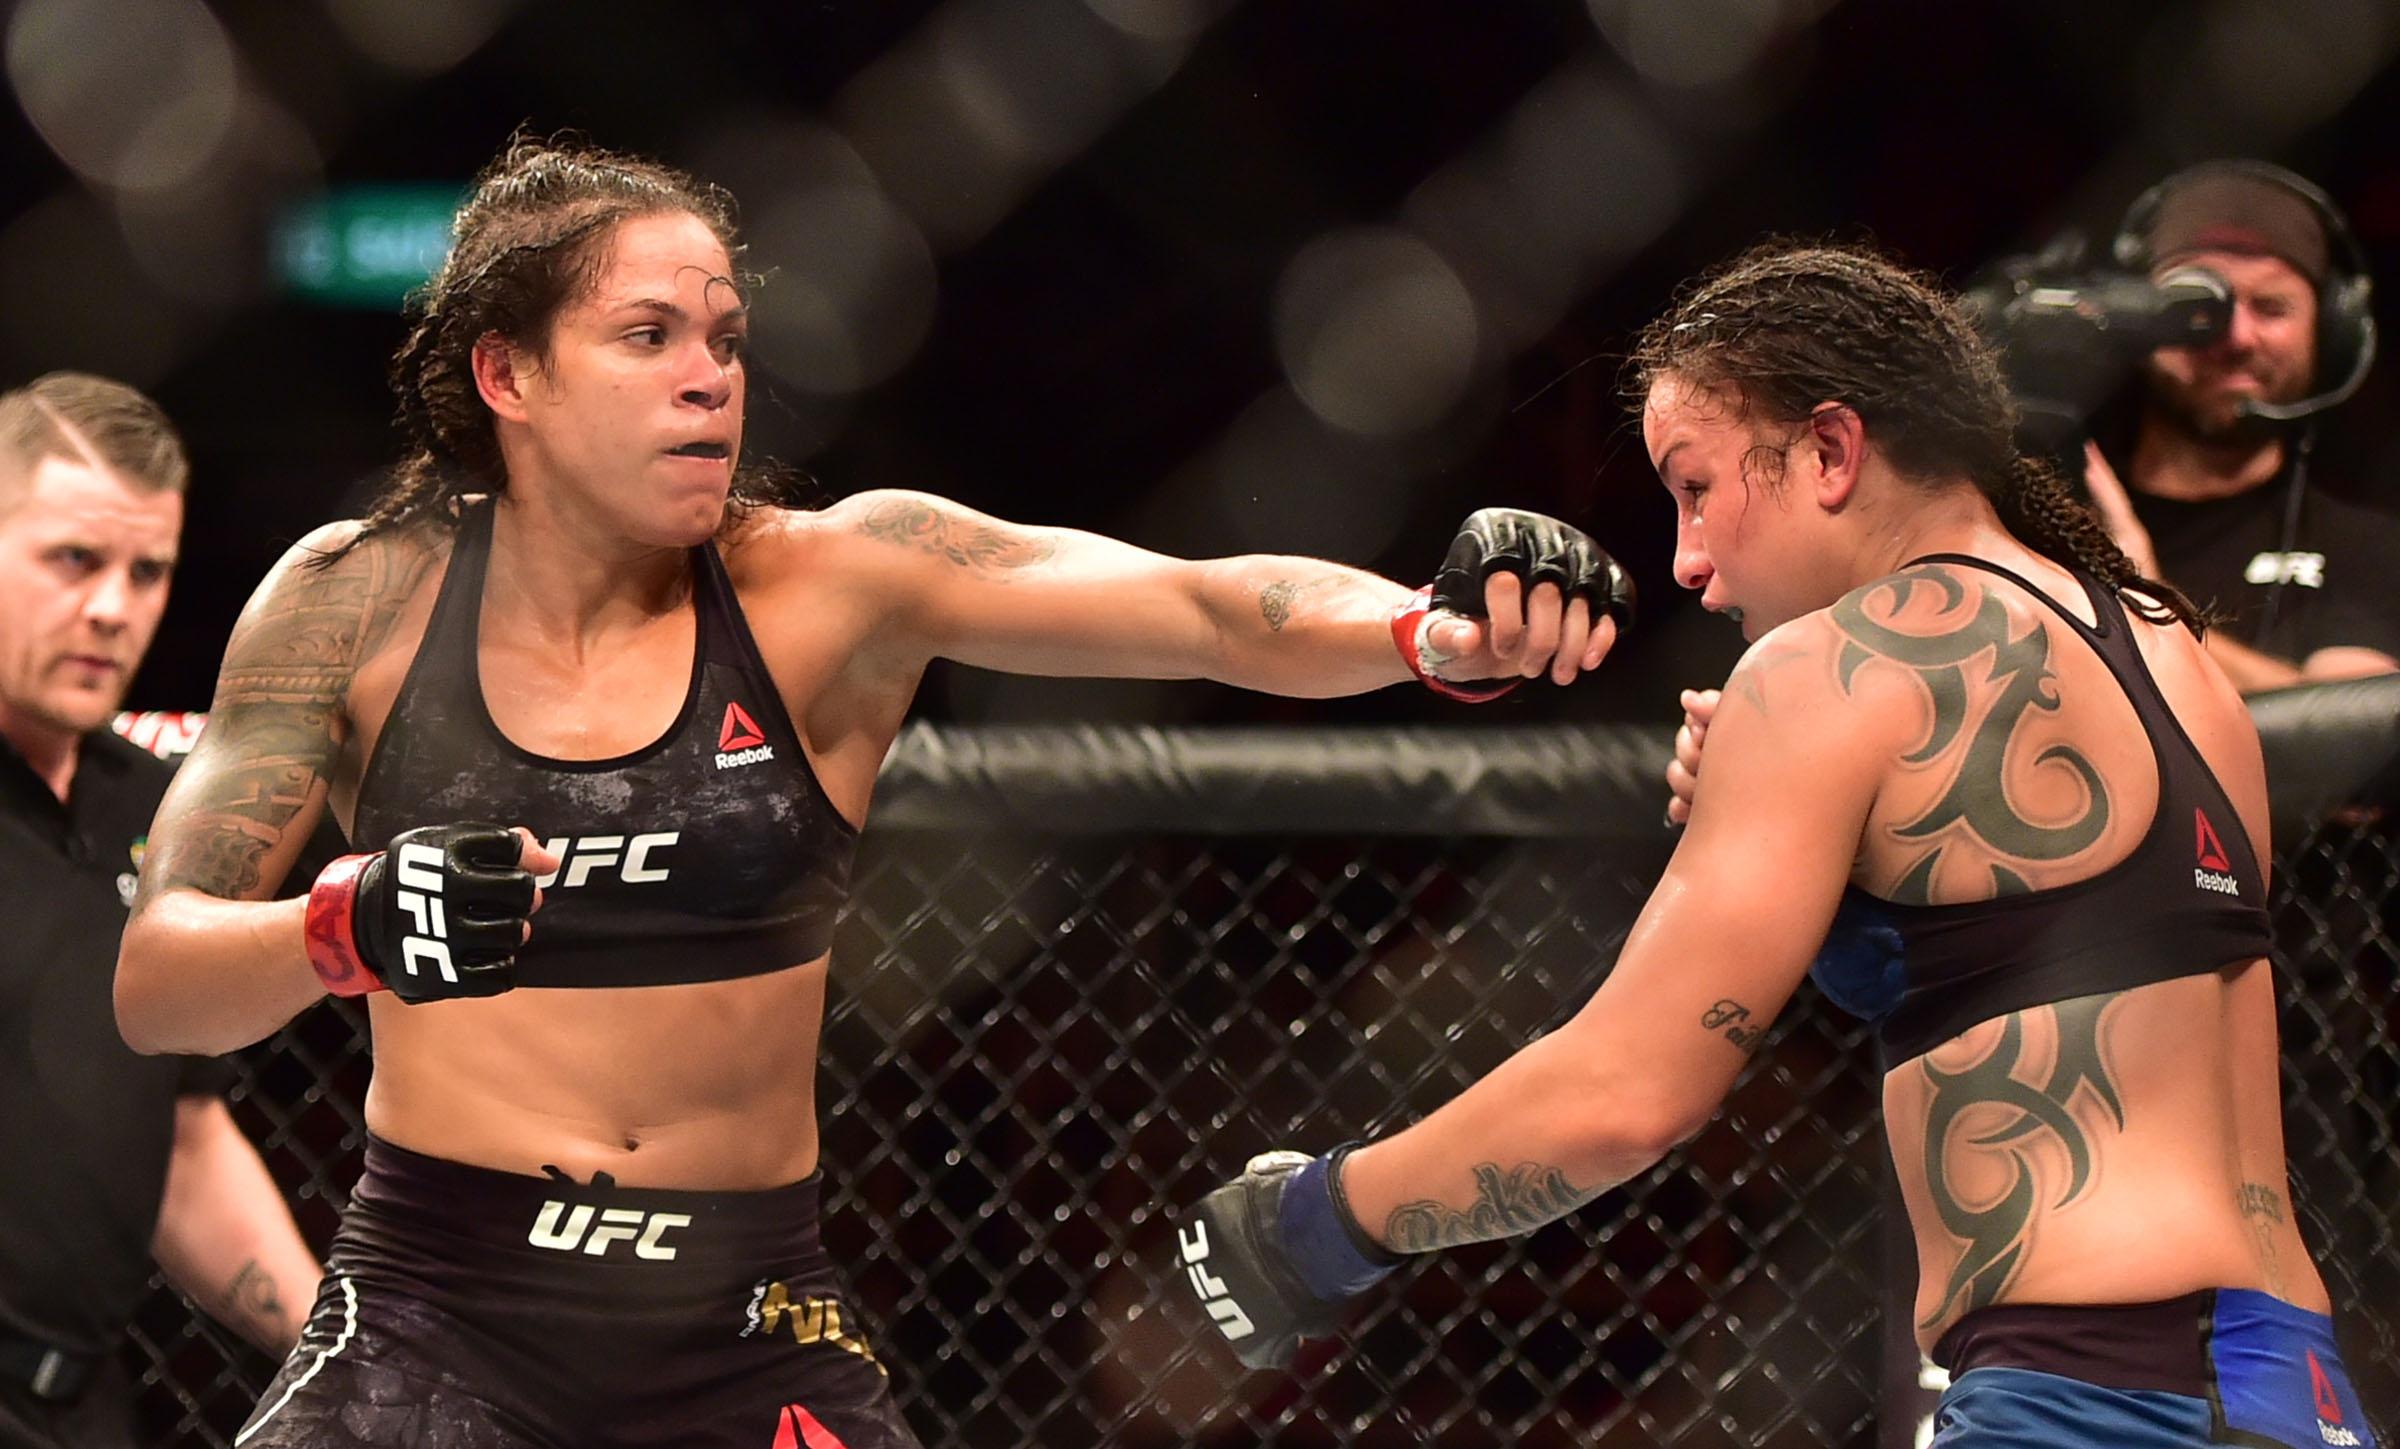 MMA: UFC 224- Nunes vs Pennington